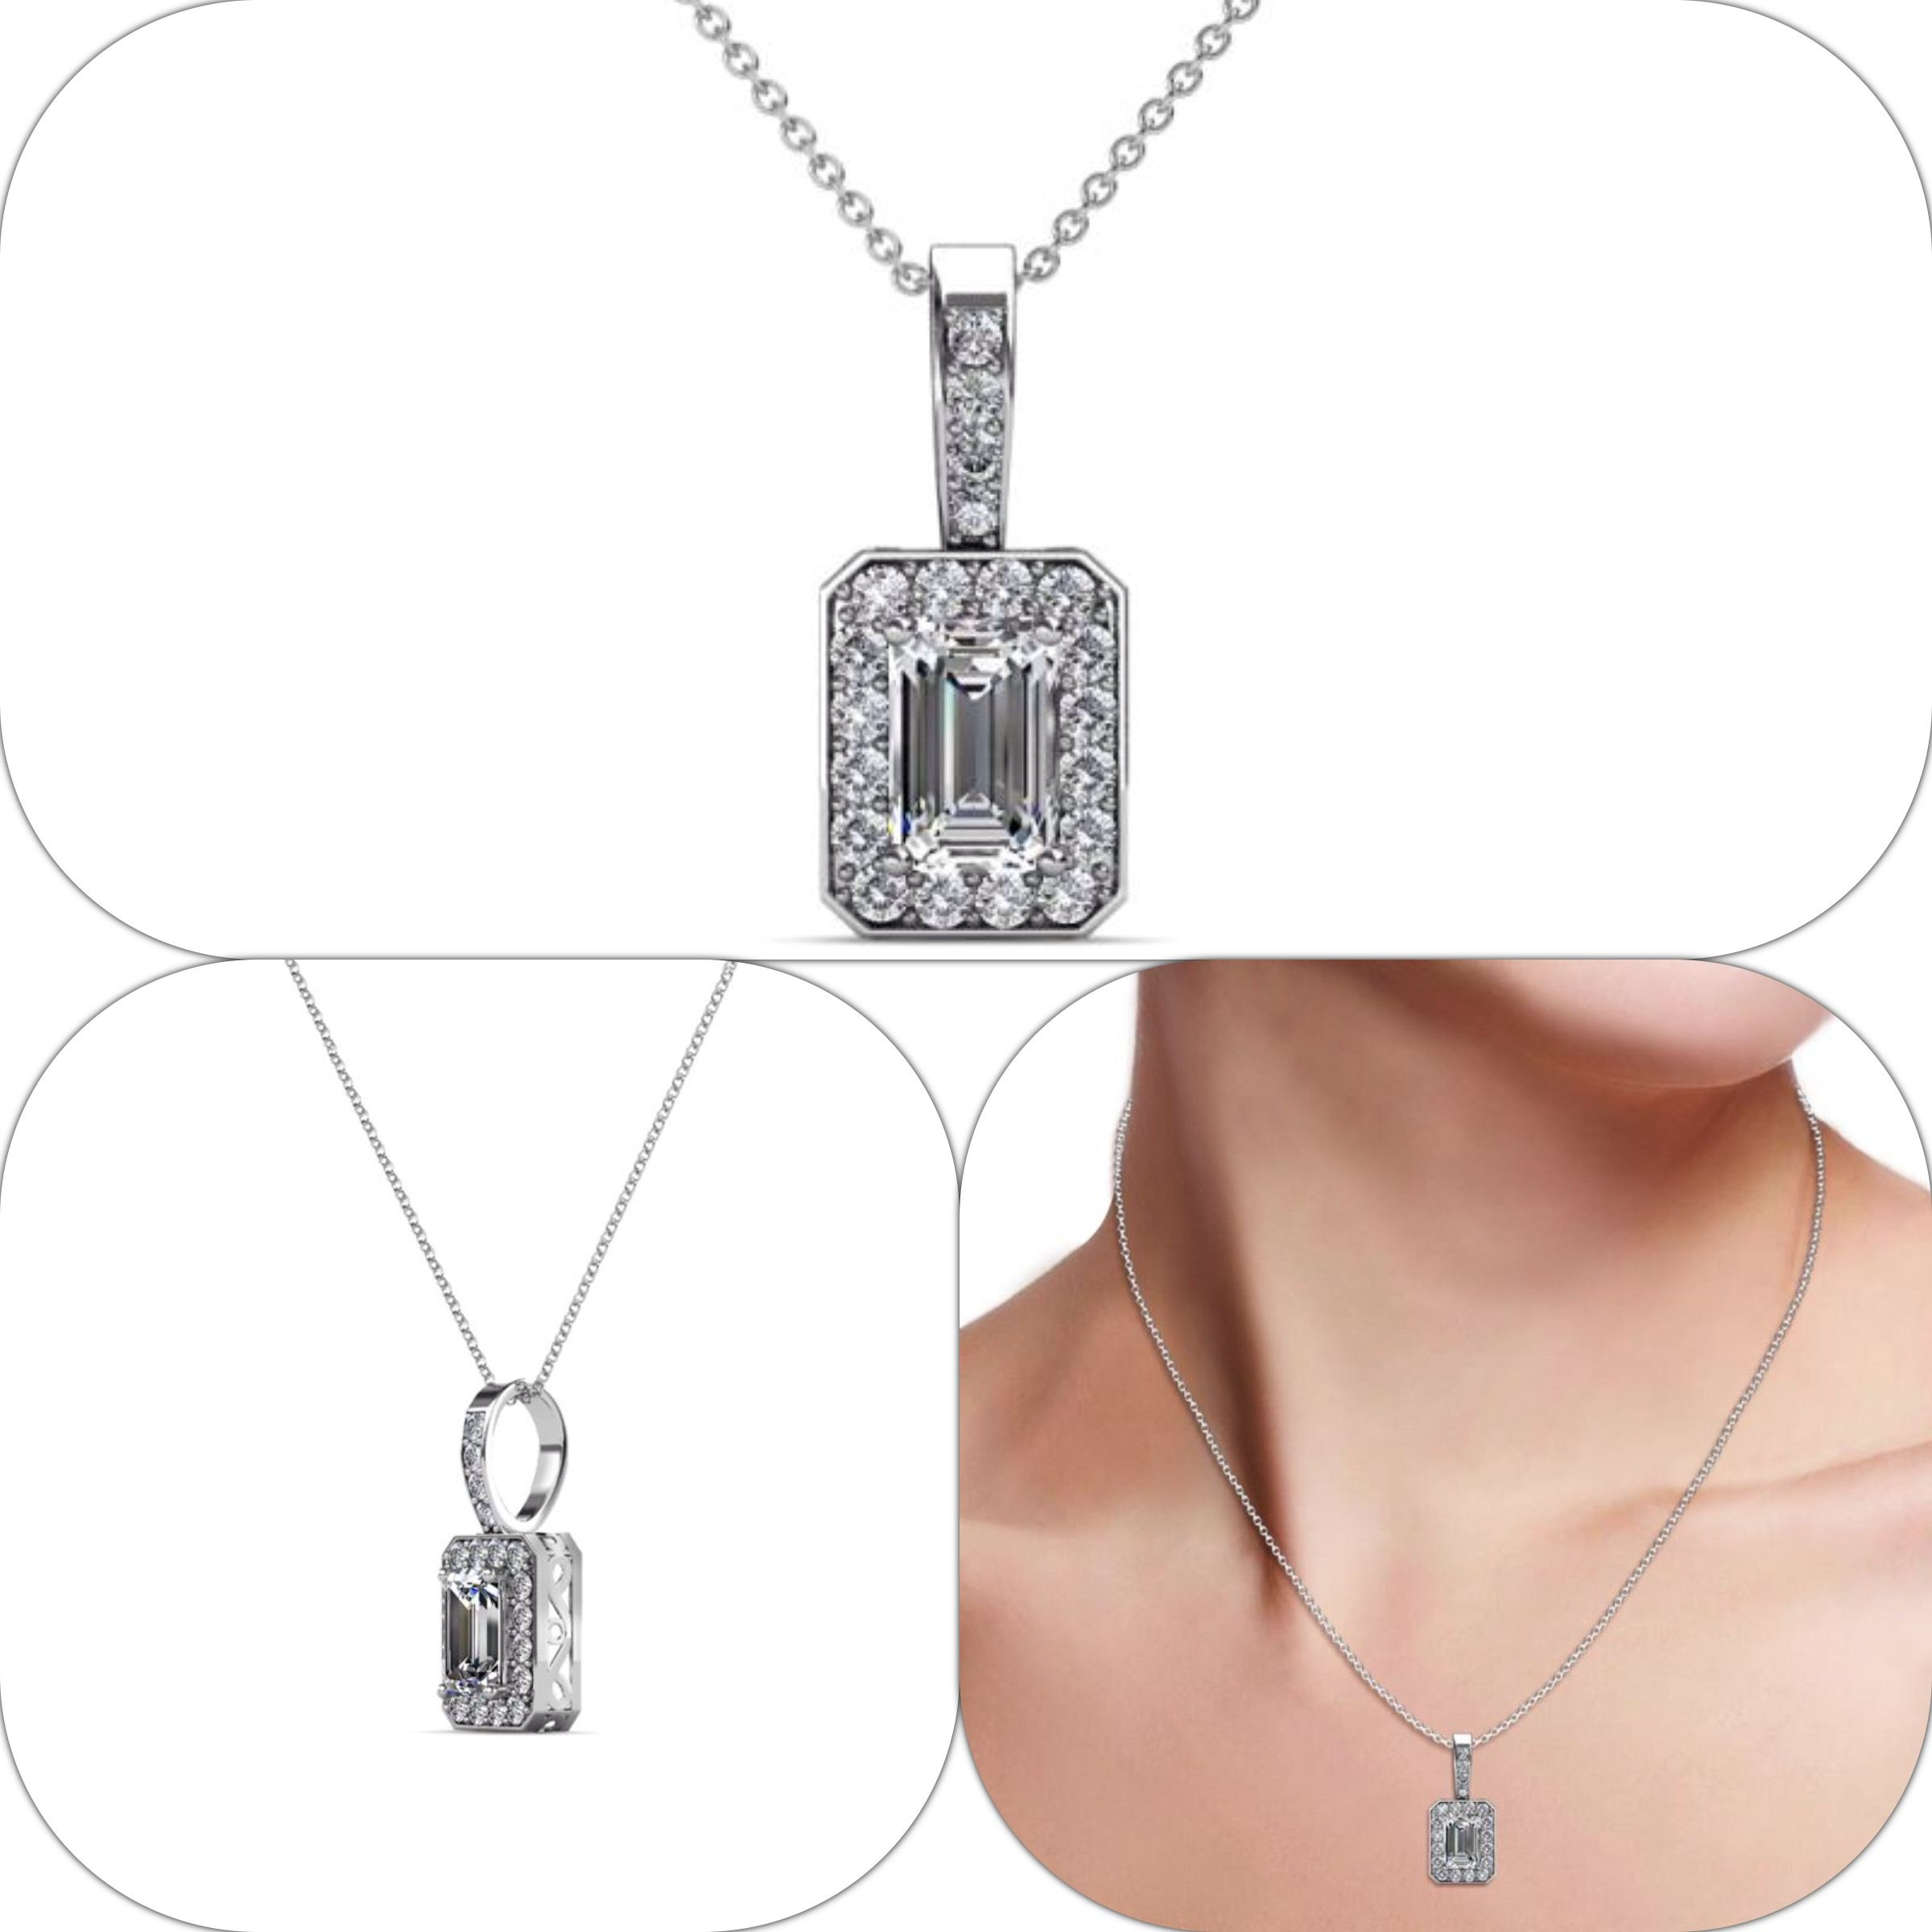 Diamond Si2 I1 G H Halo Pendant 0 75 Carat Tw In 14k Gold Jp 80674 Ebay Halo Pendant Halo Necklace Pendant